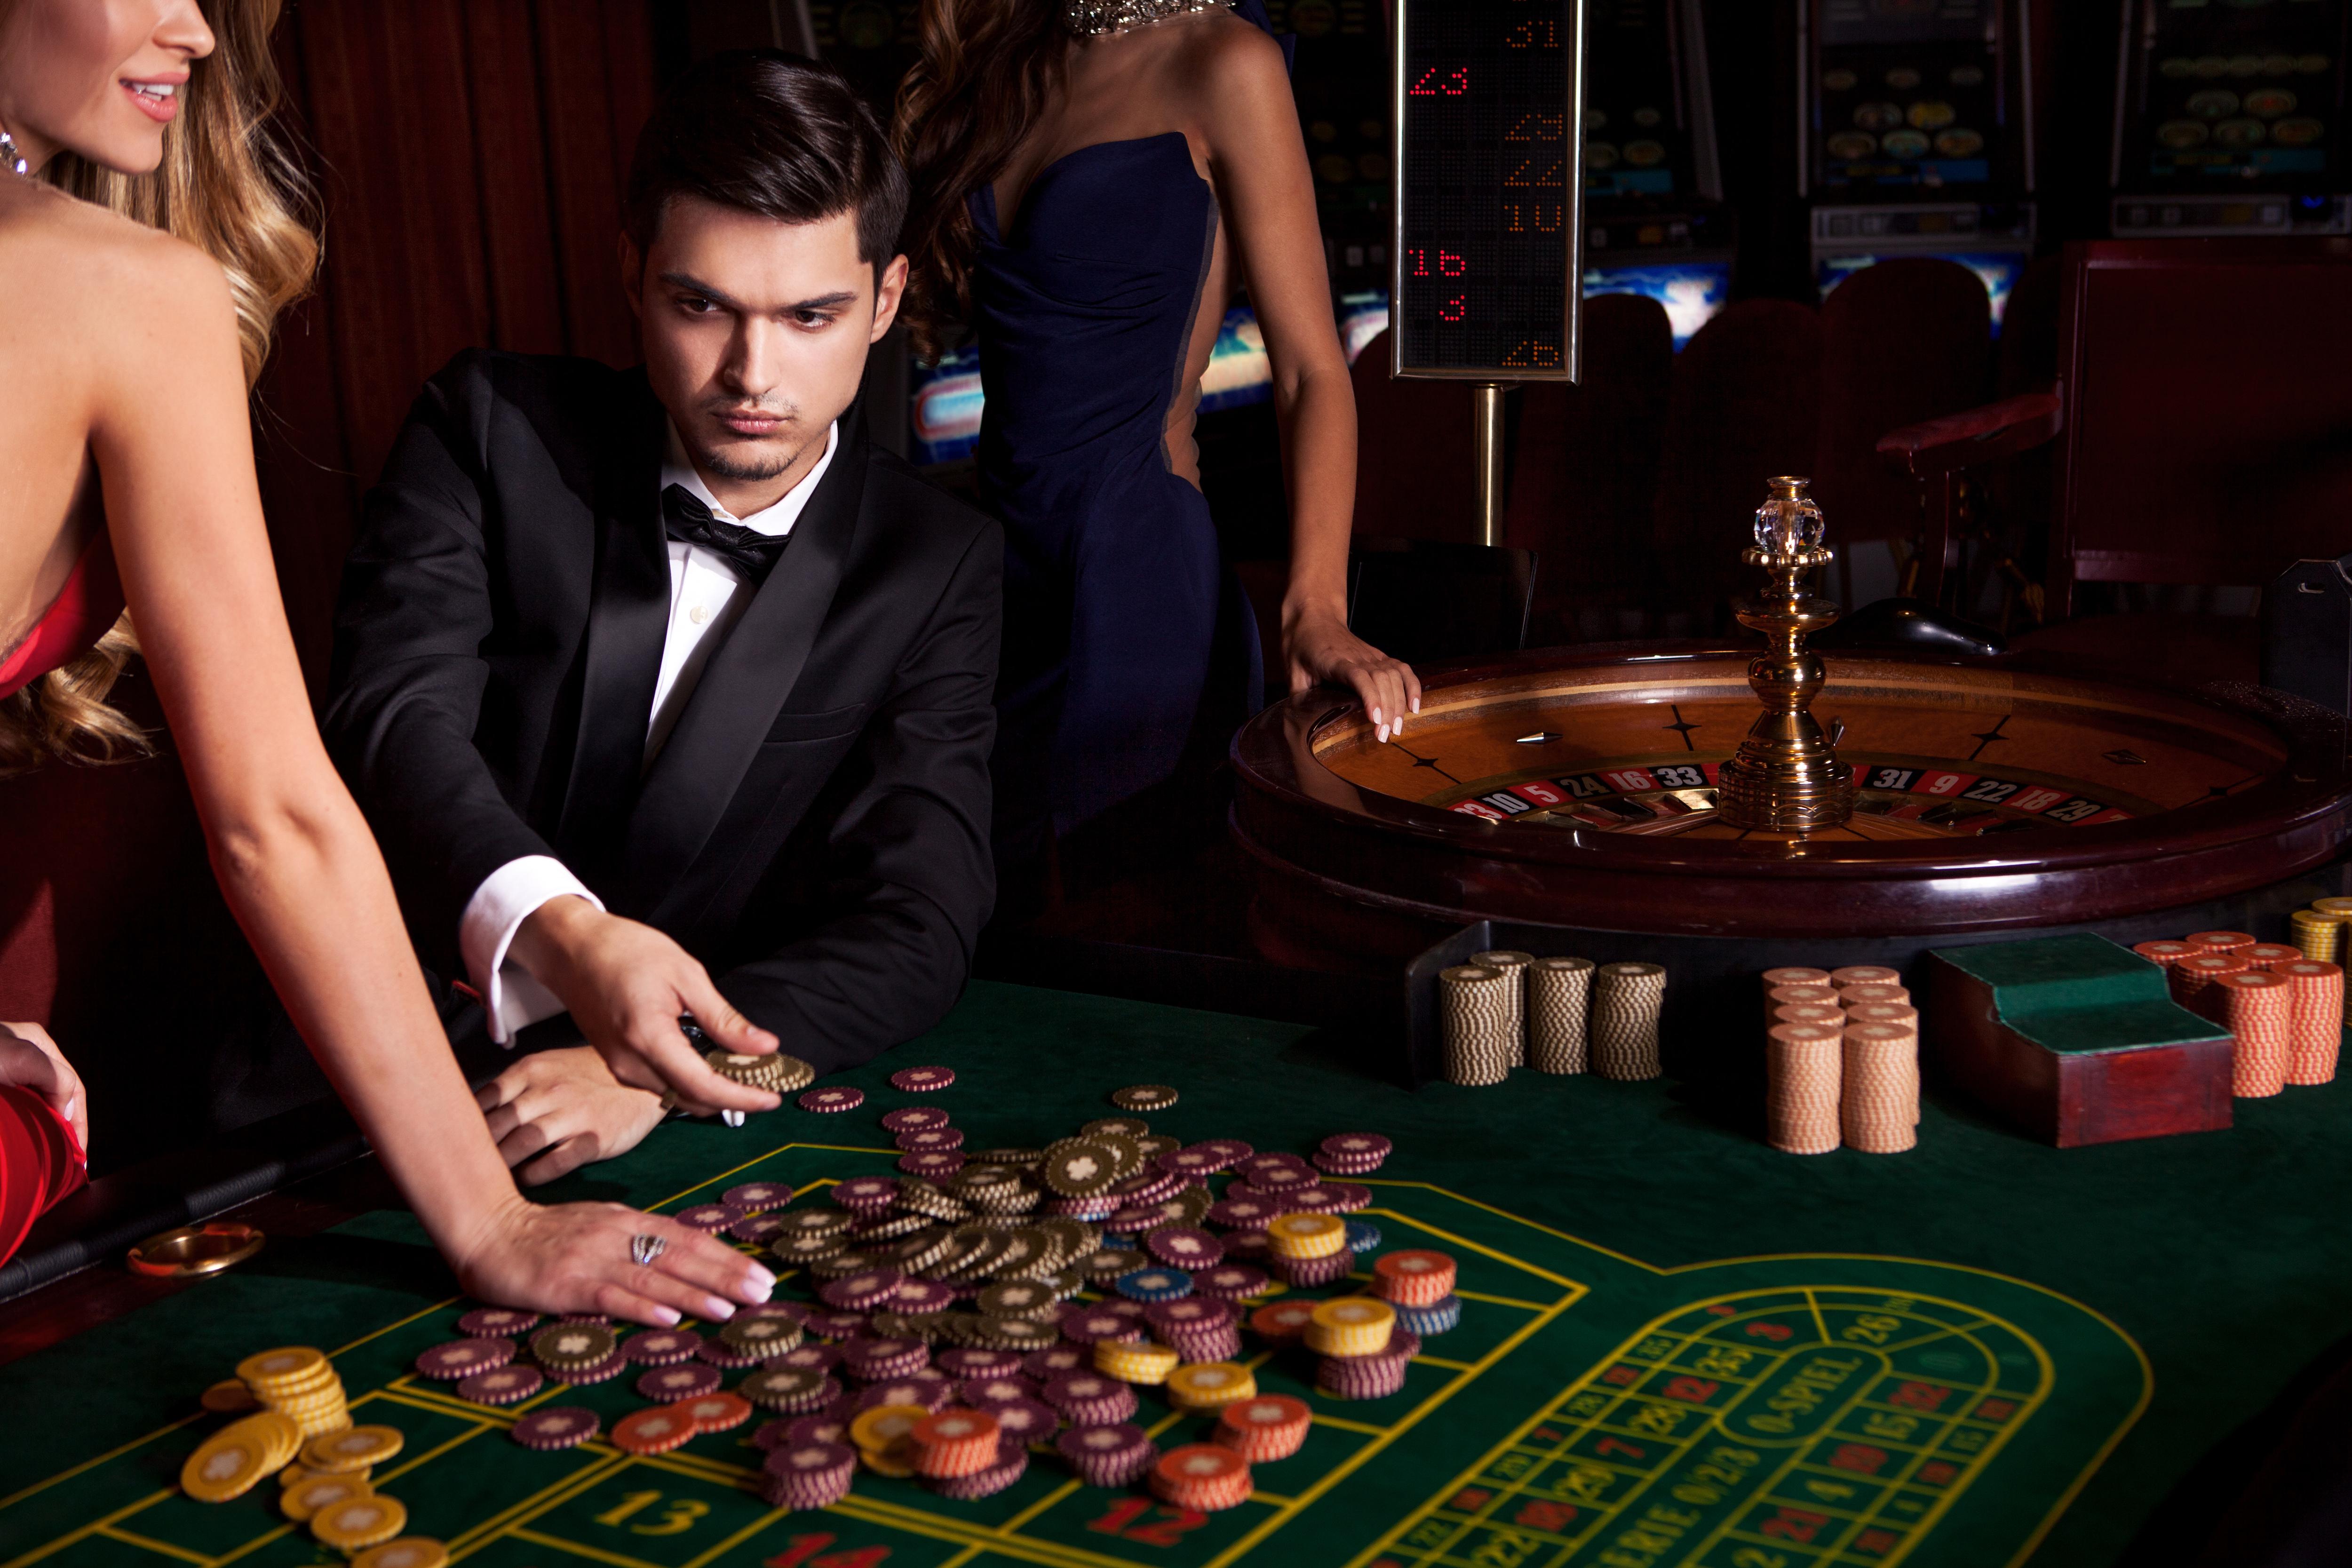 игра казино с мужиком на лодке